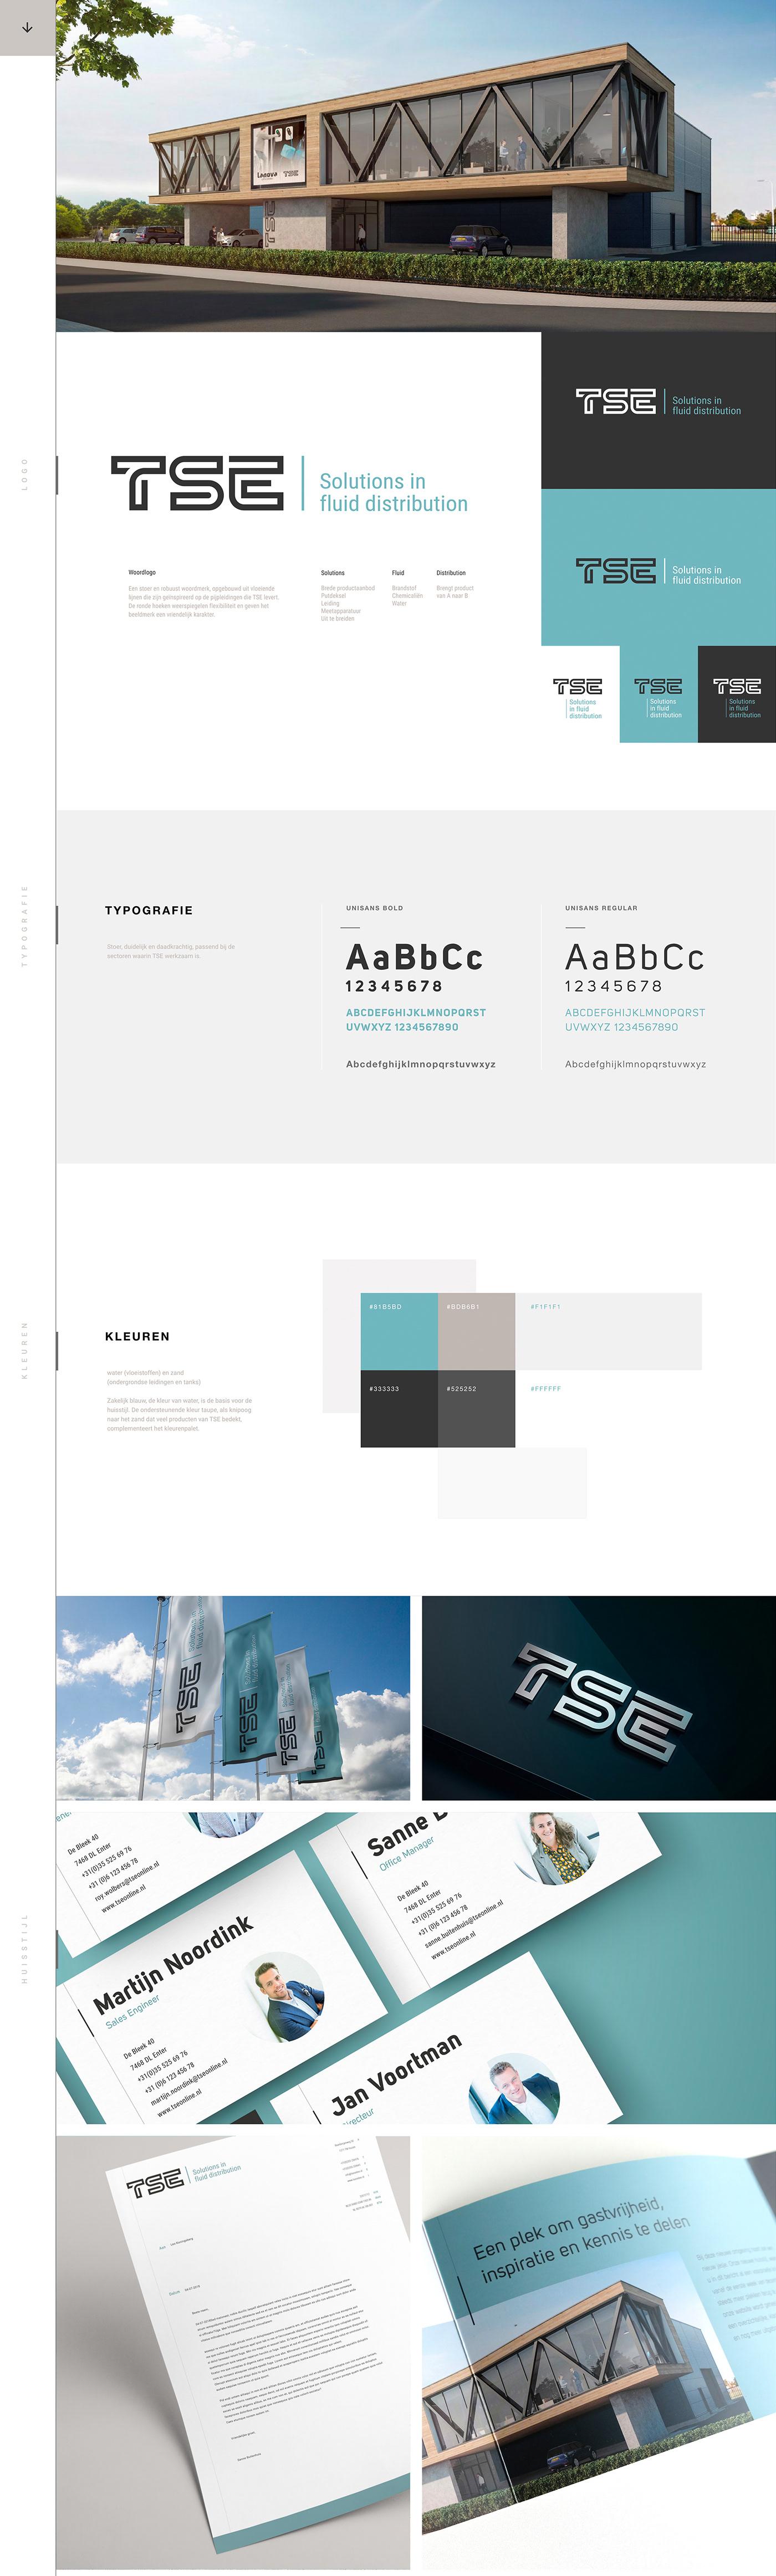 branding  Corporate Identity Photography  b2b logo Webdesign graphicdesign grafisch ontwerp webontwerp